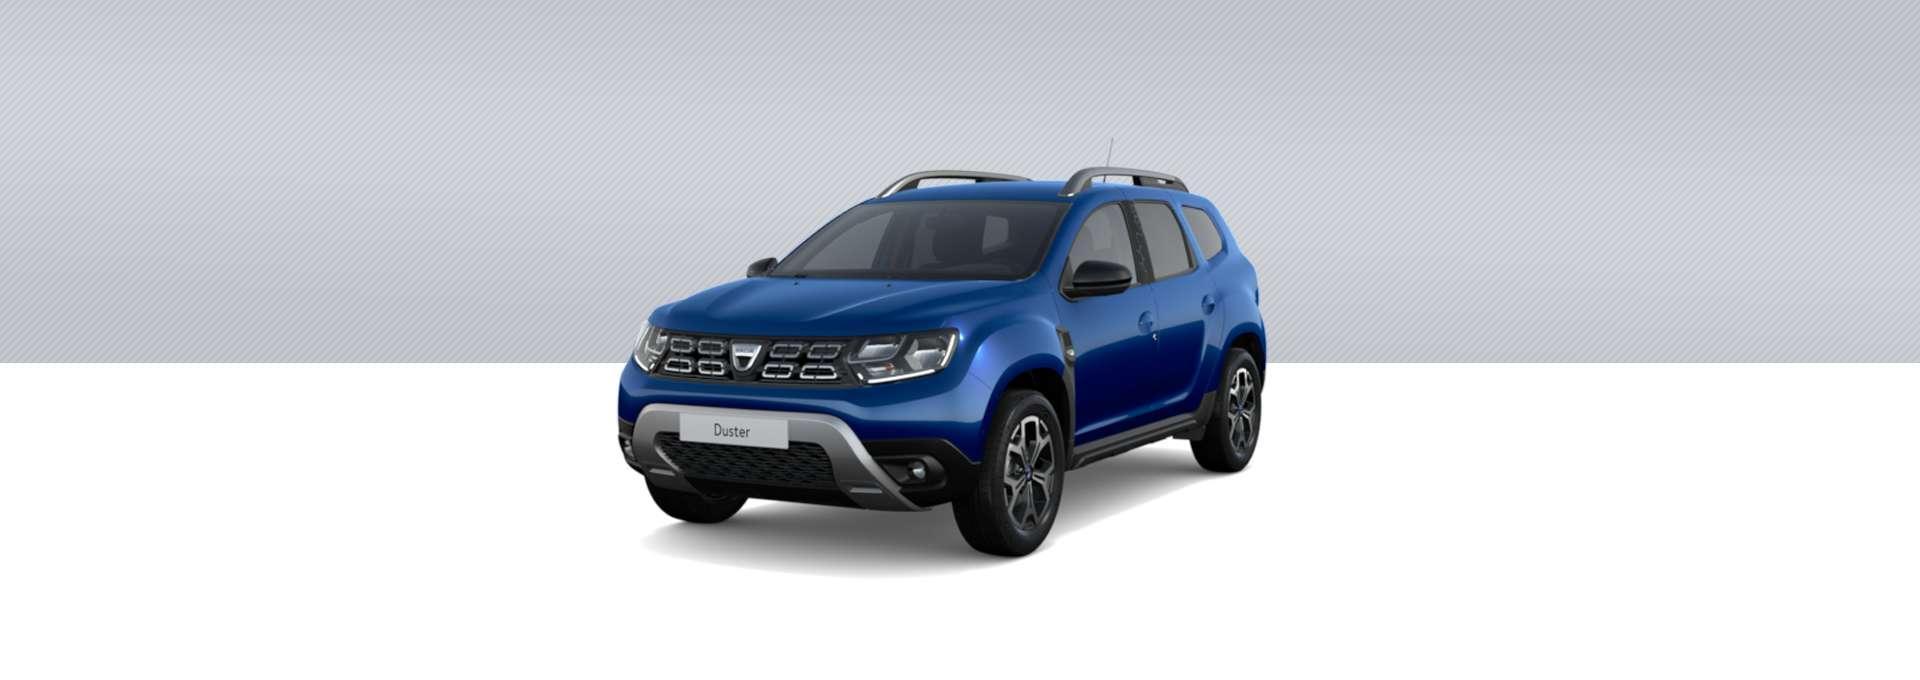 Dacia DUSTER ANIVERSARIO